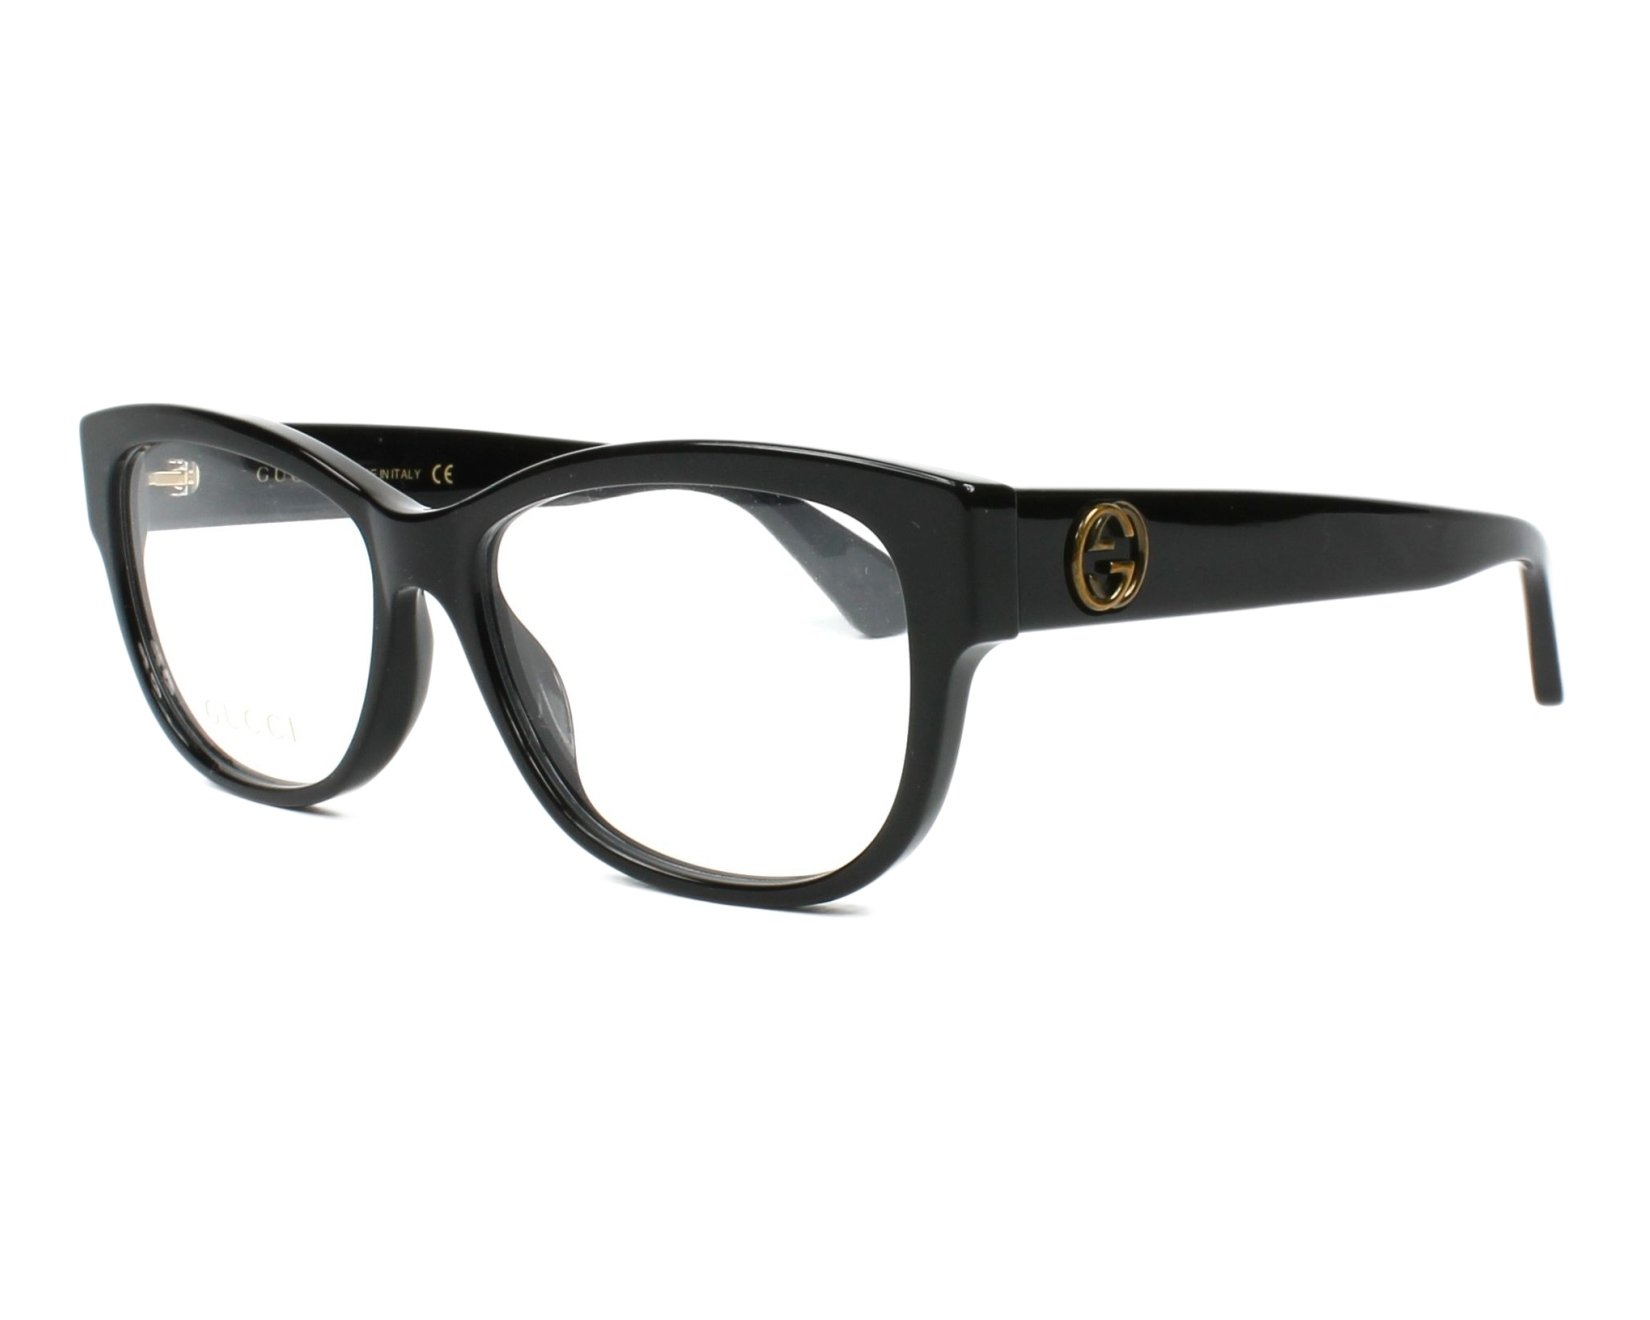 Gucci Eyeglasses GG-00980 001 Black